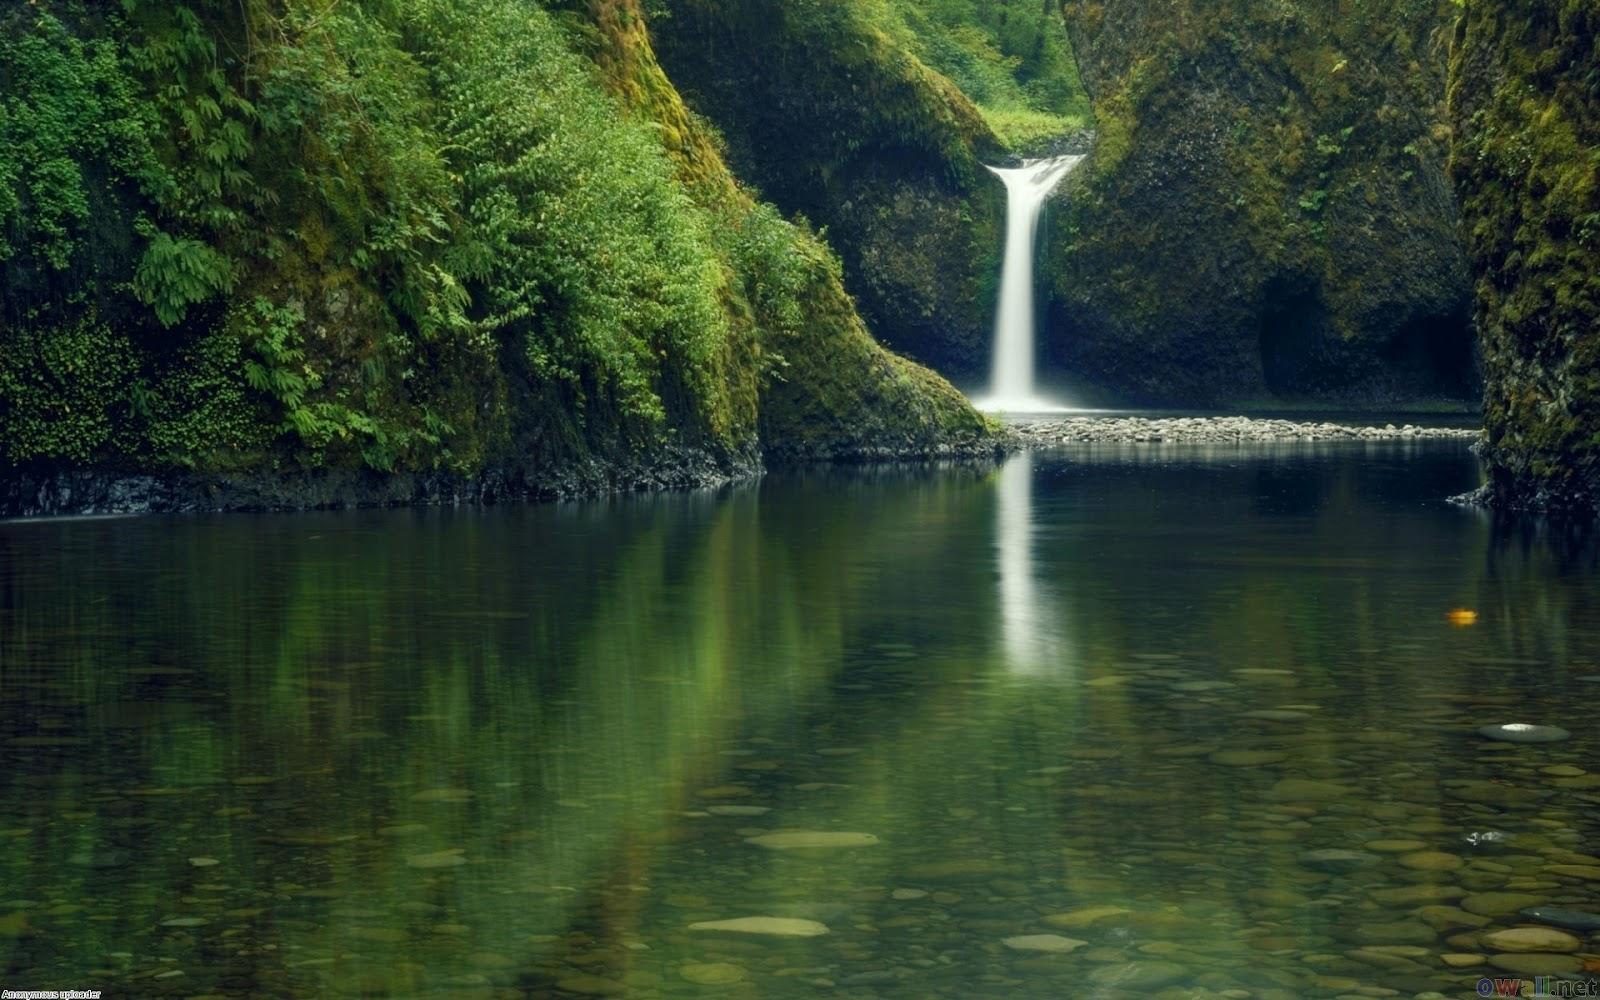 wallpaper proslut Full HD Waterfall Nature Wallpapers Widescreen for 1600x1000